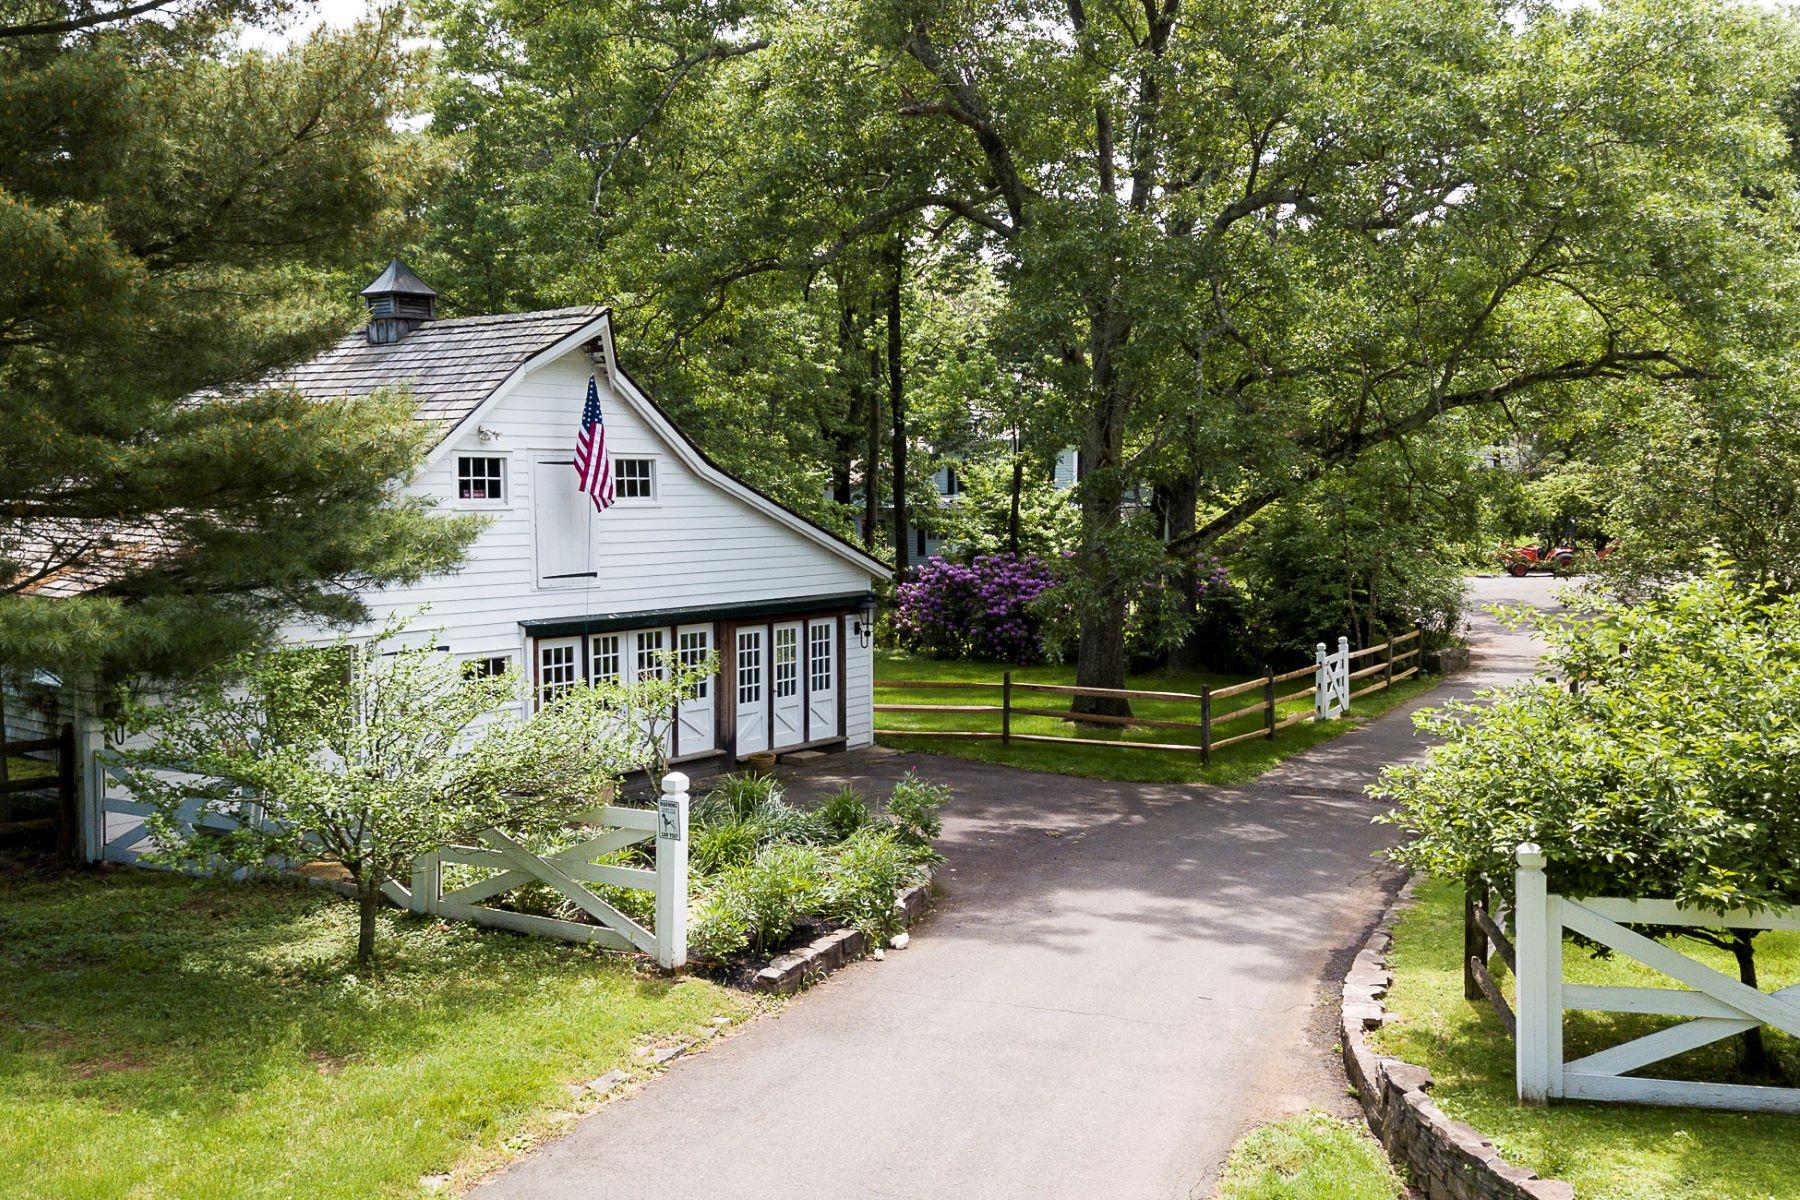 Additional photo for property listing at Elm Ridge Farm 7 Aqua Terrace, Pennington, Νιου Τζερσεϋ 08534 Ηνωμένες Πολιτείες